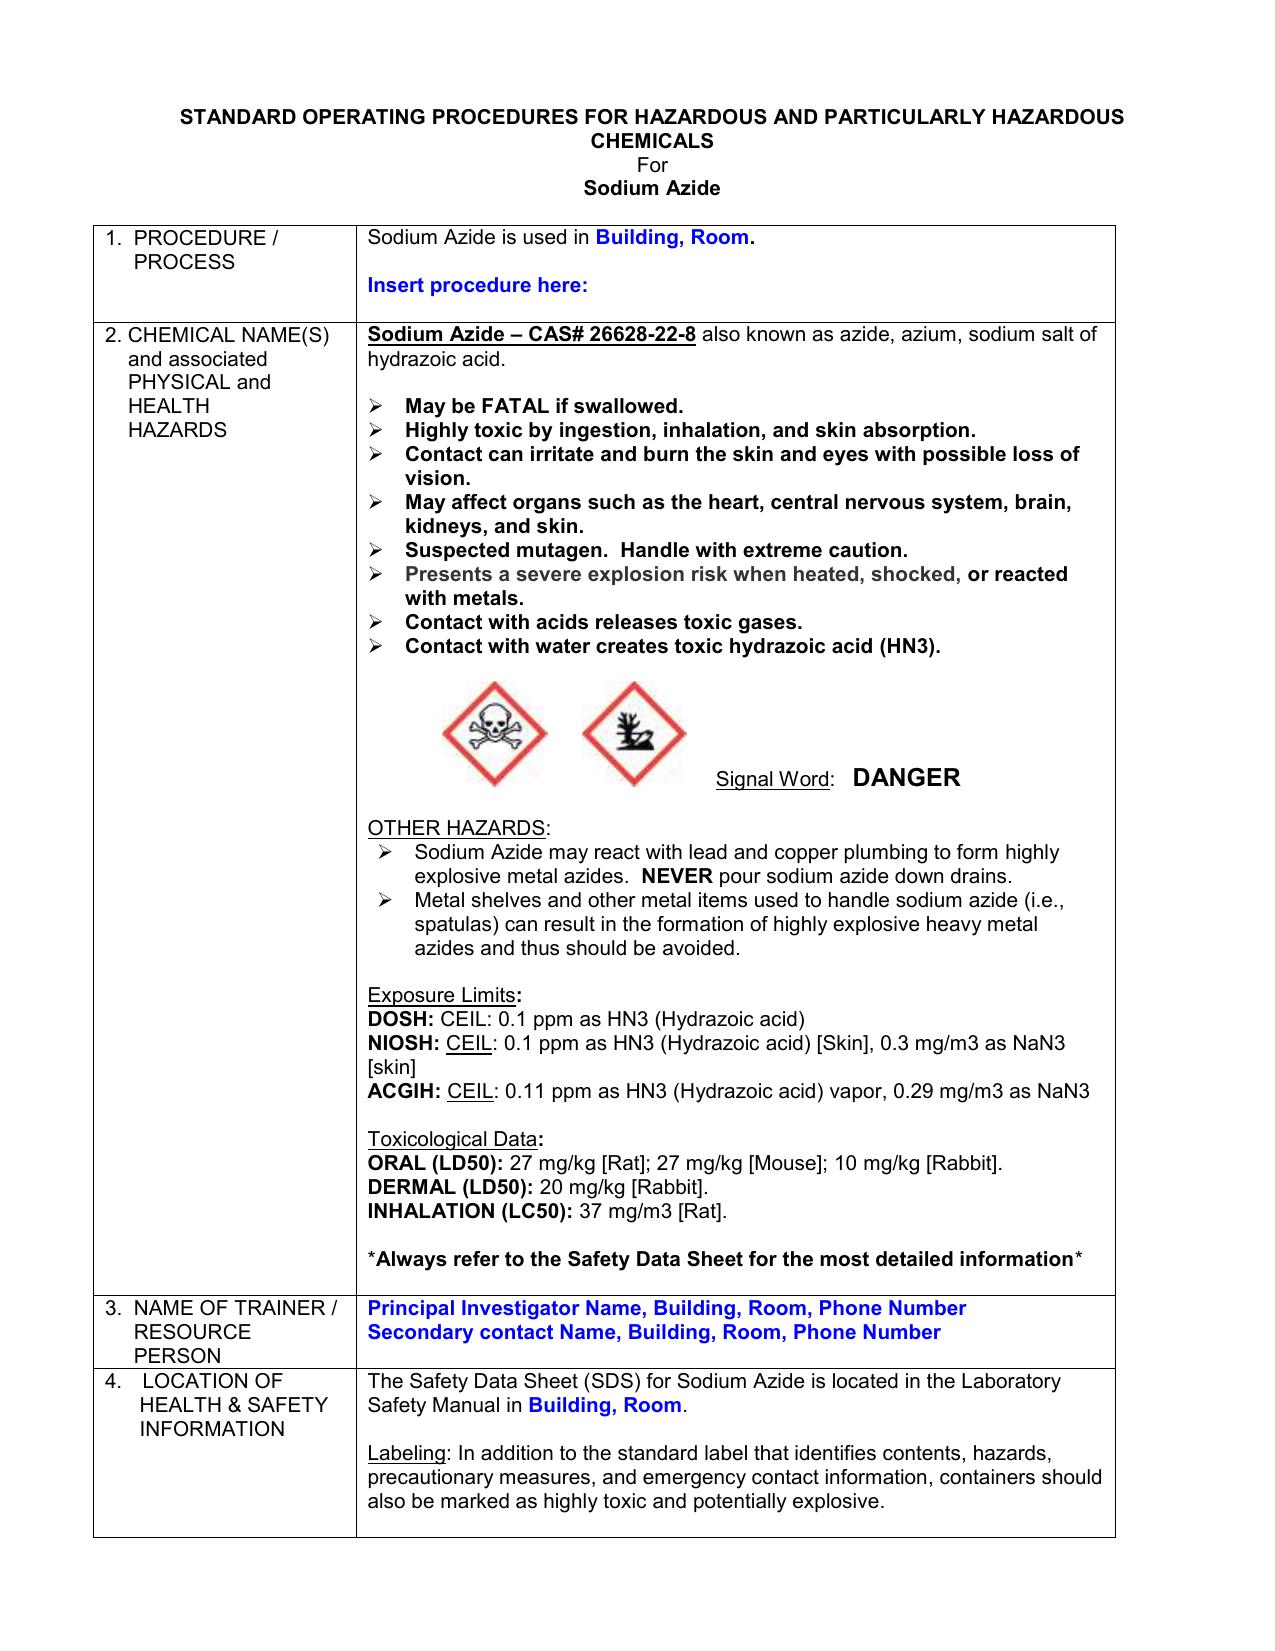 Wsu environmental health safety environmental health - Wsu Environmental Health Safety Environmental Health 9